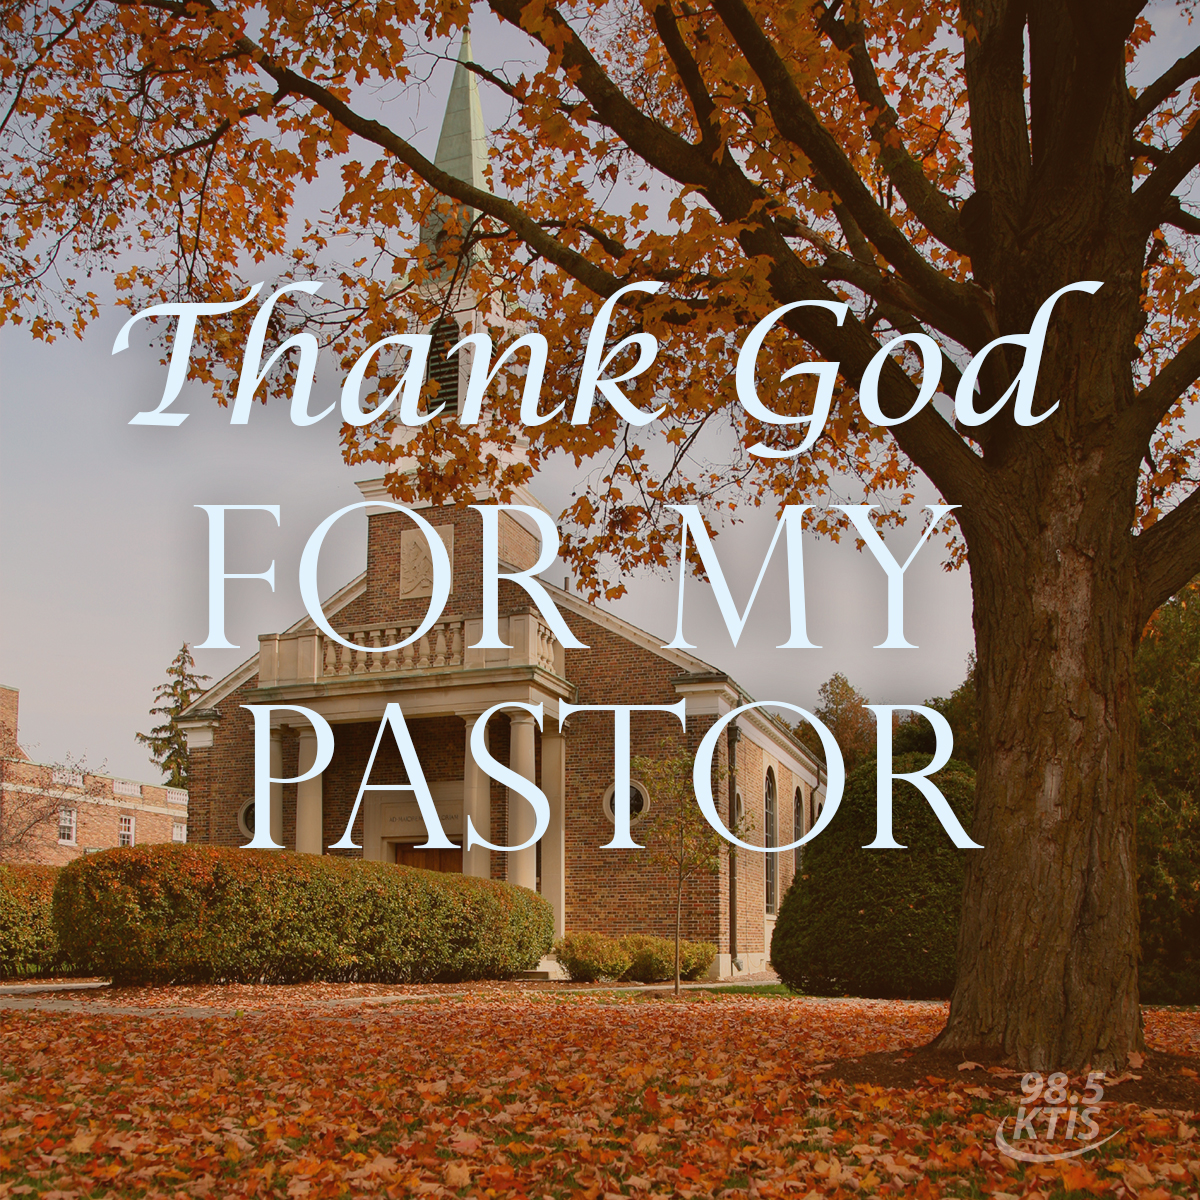 Pump Up Your Pastor 98 5 Ktis 98 5 Ktis